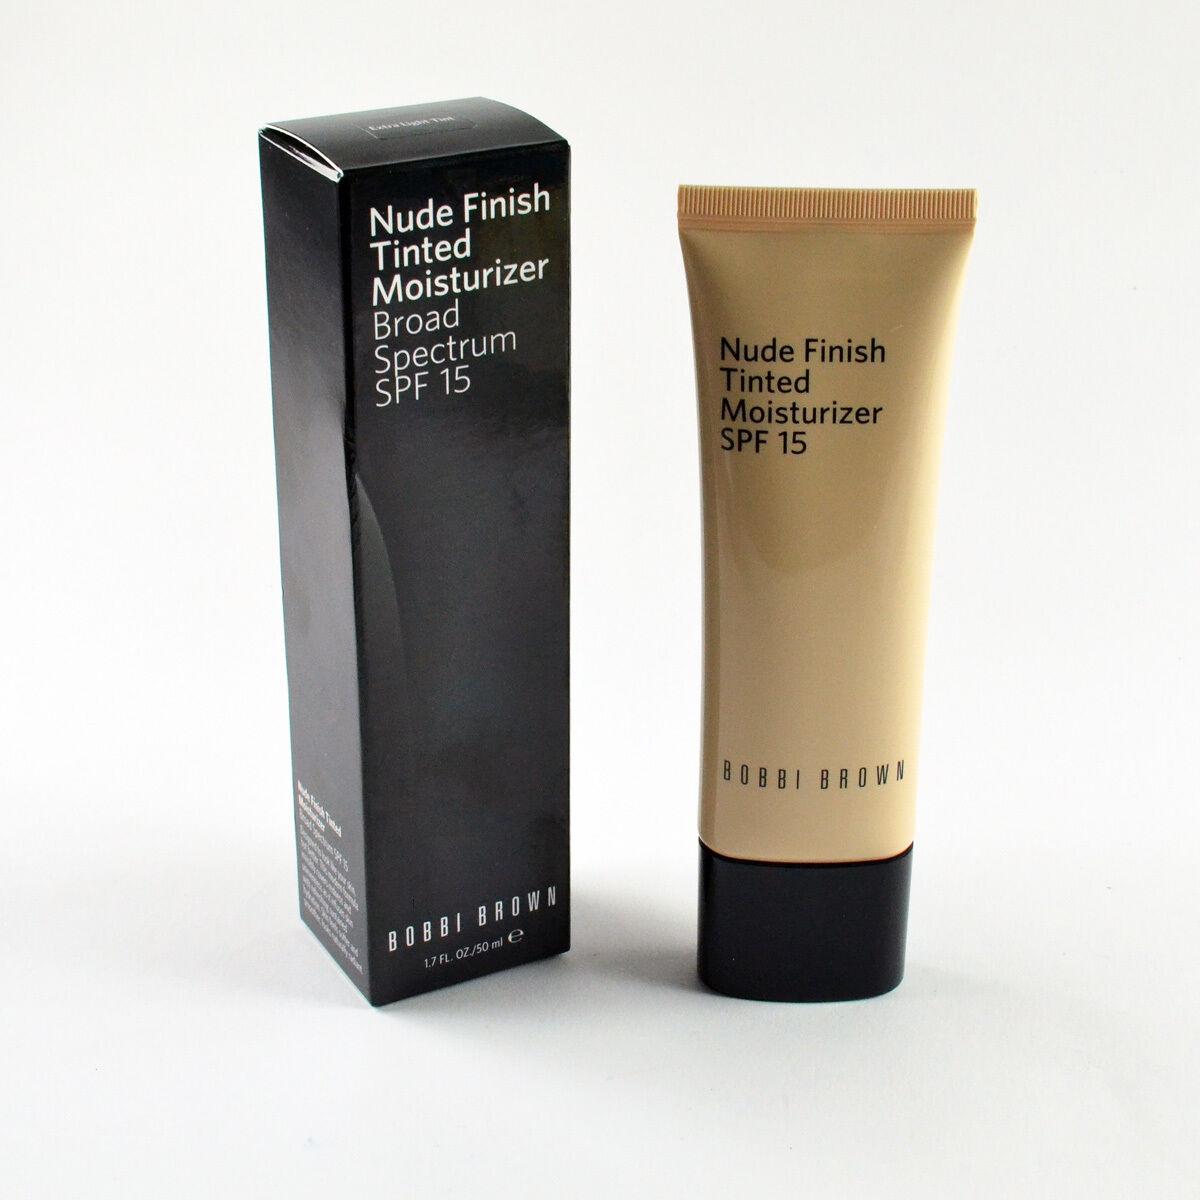 Bobbi Brown Nude Finish Tinted Moisturizer SPF15 Extra Light